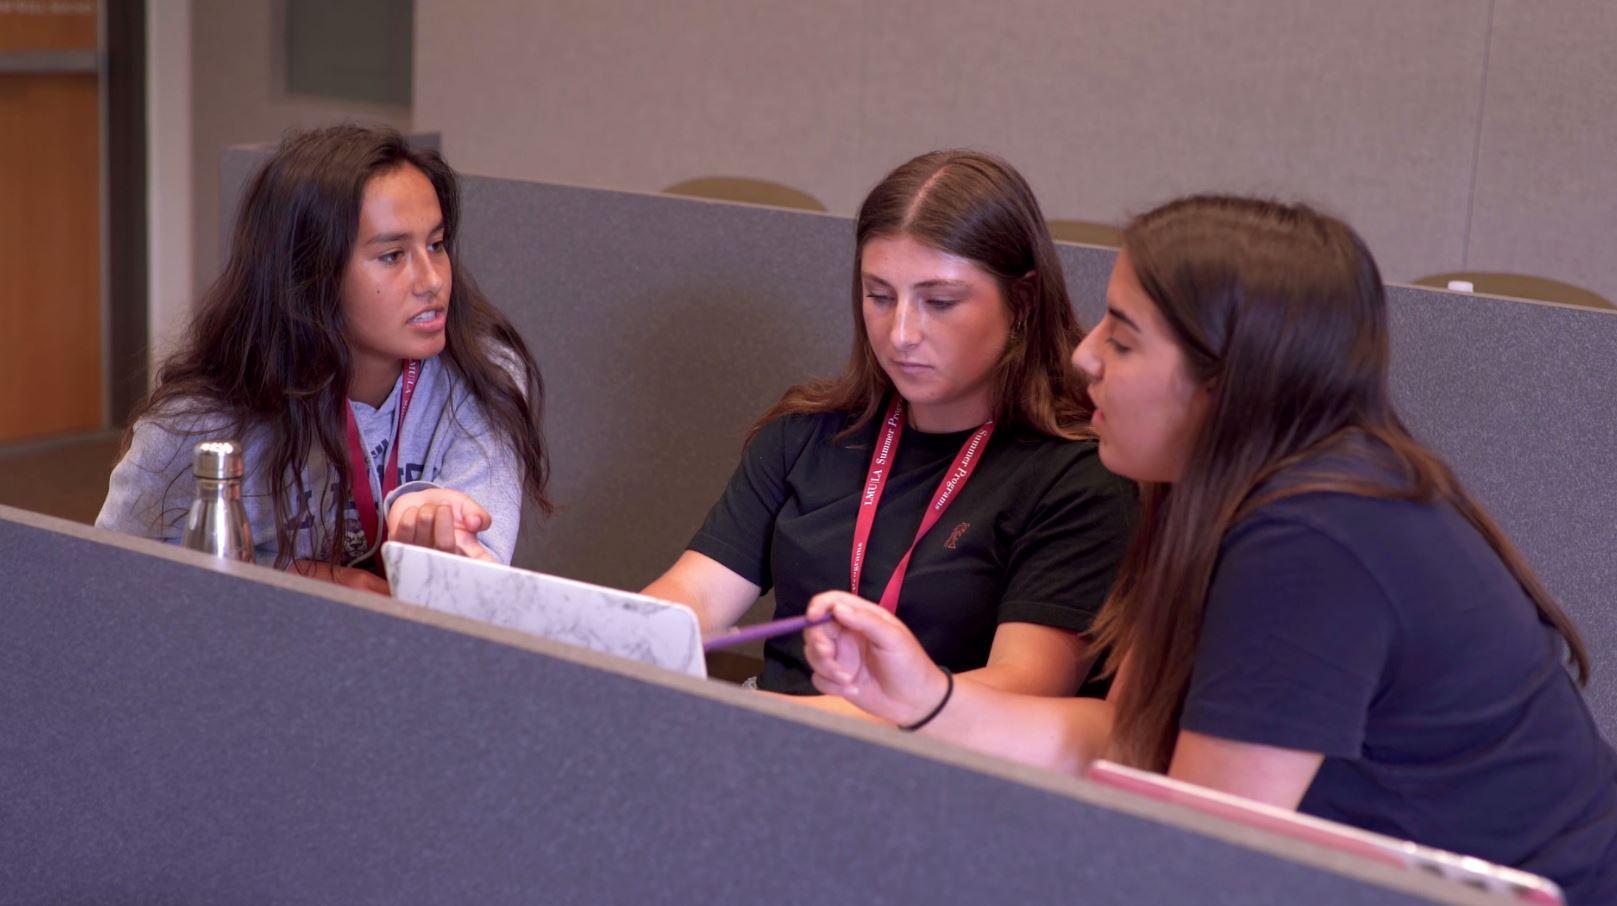 Summer Program - Business | LMU Pre-College Programs: Intro to Entrepreneurship